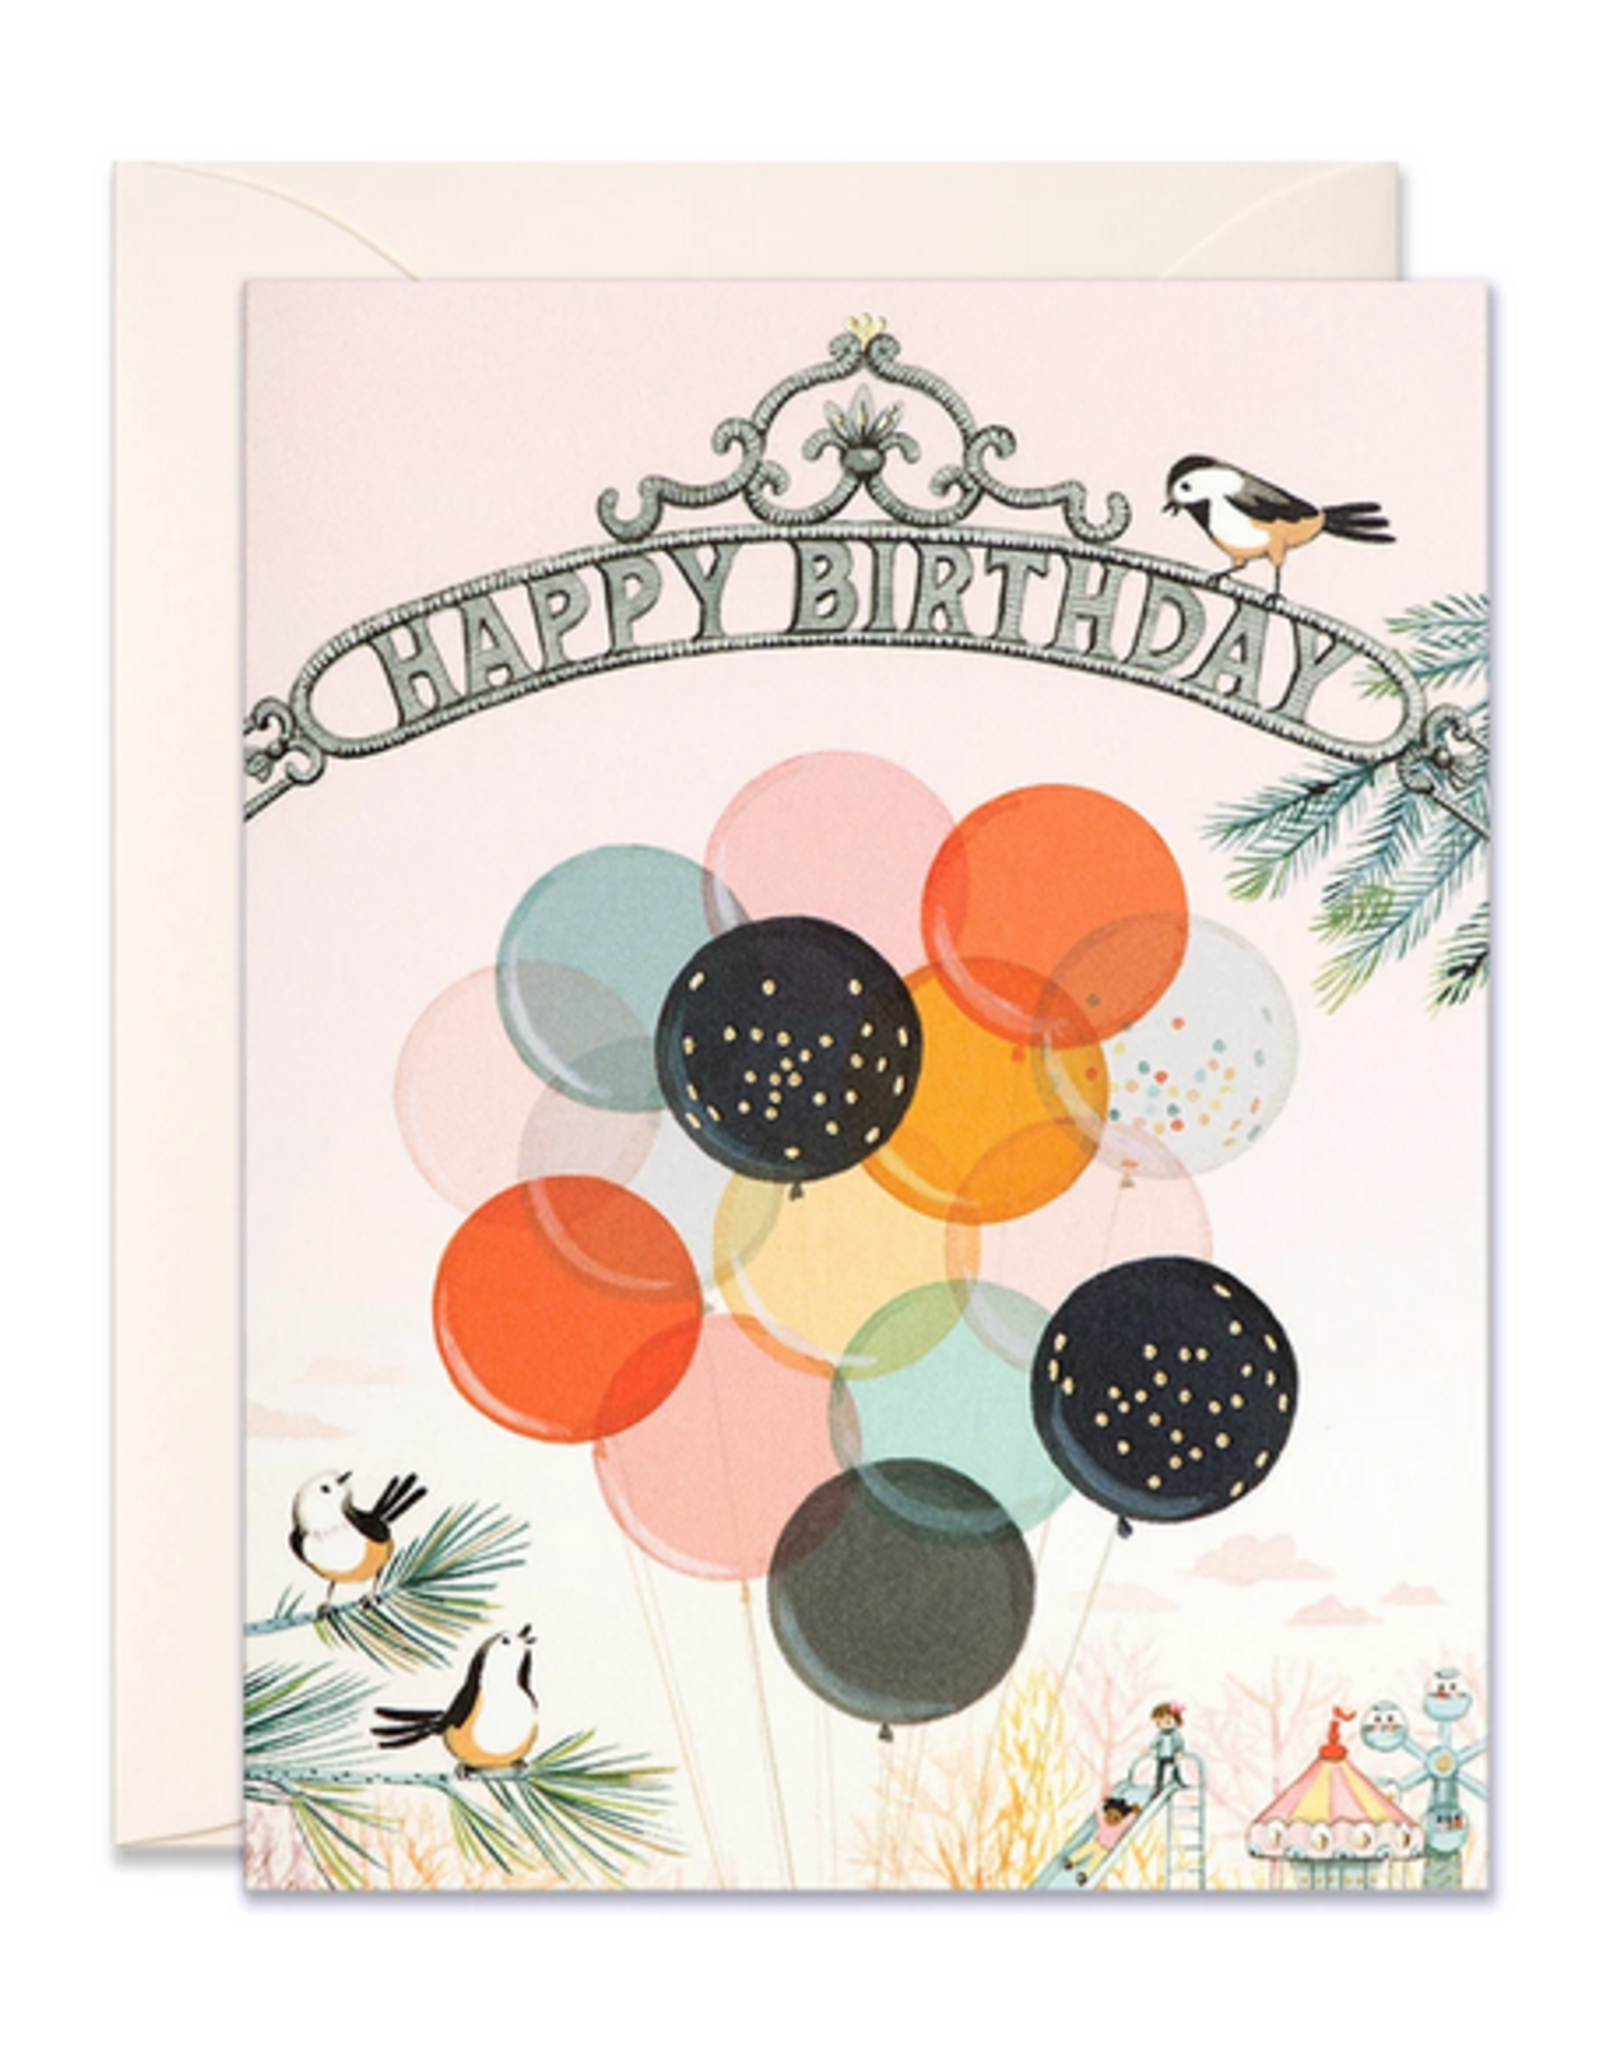 Happy Birthday (Park Gate) Greeting Card